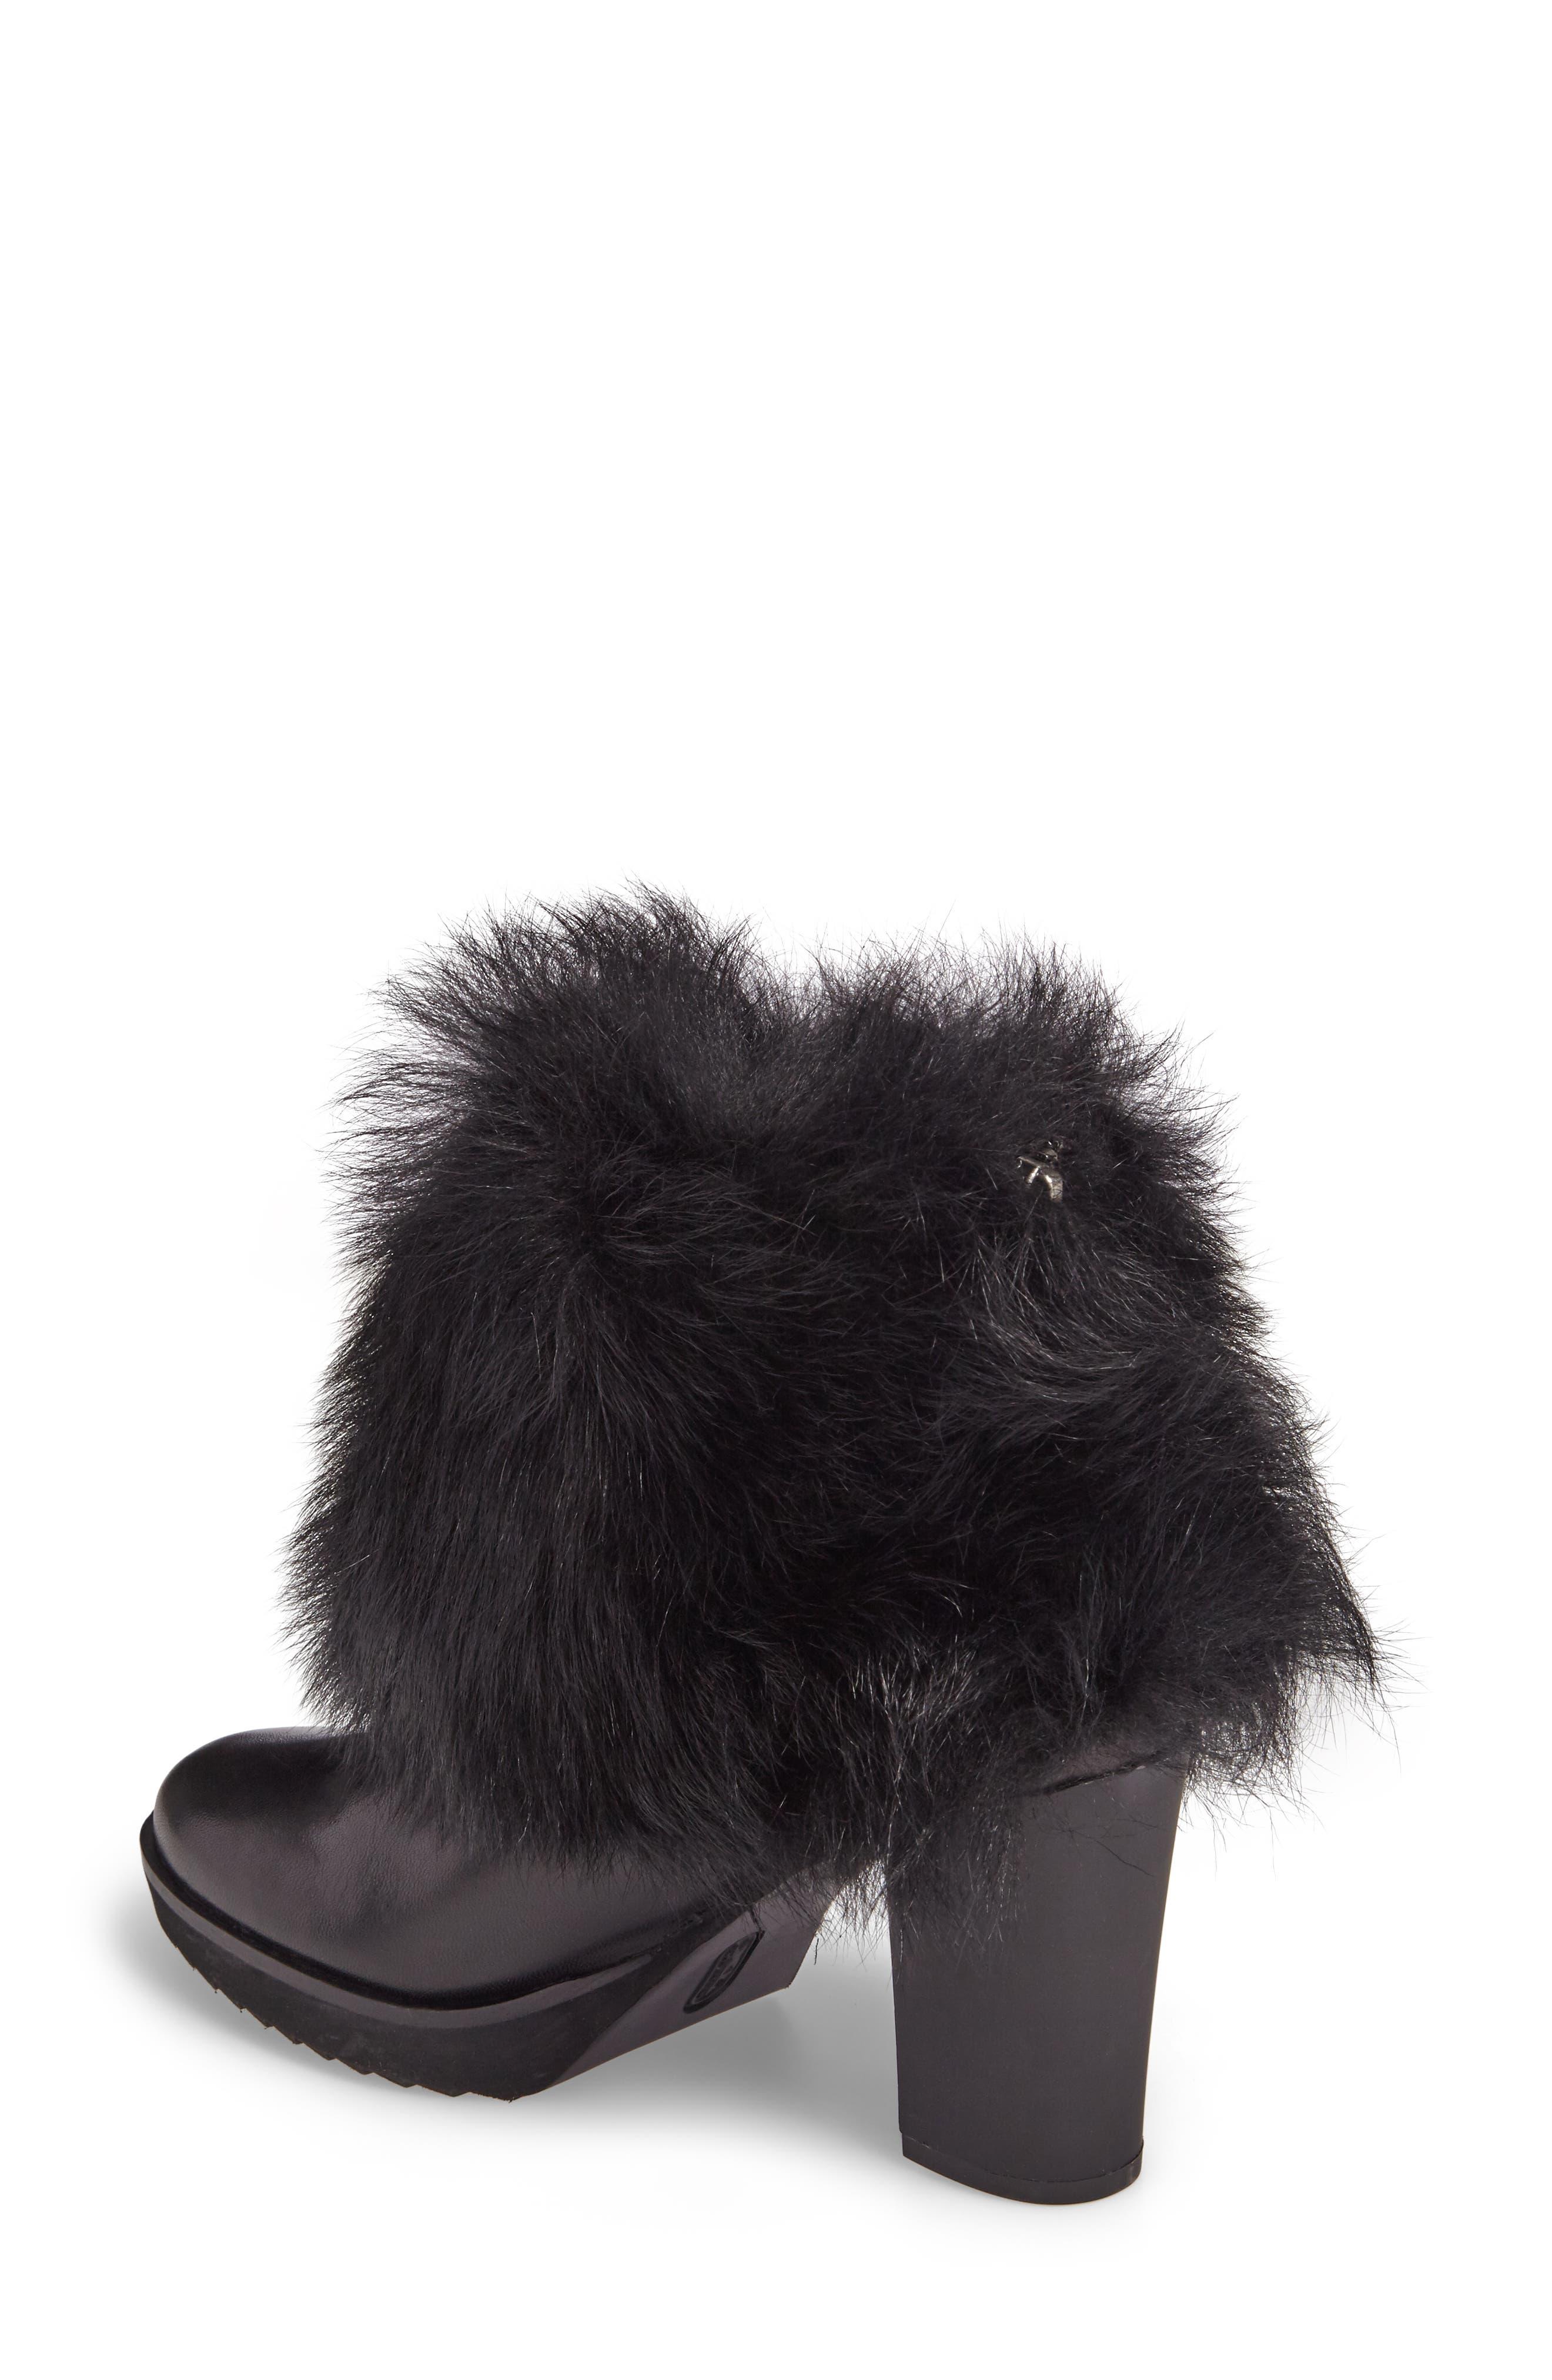 Roslyn Block Heel Genuine Shearling Bootie,                             Alternate thumbnail 2, color,                             Black Leather